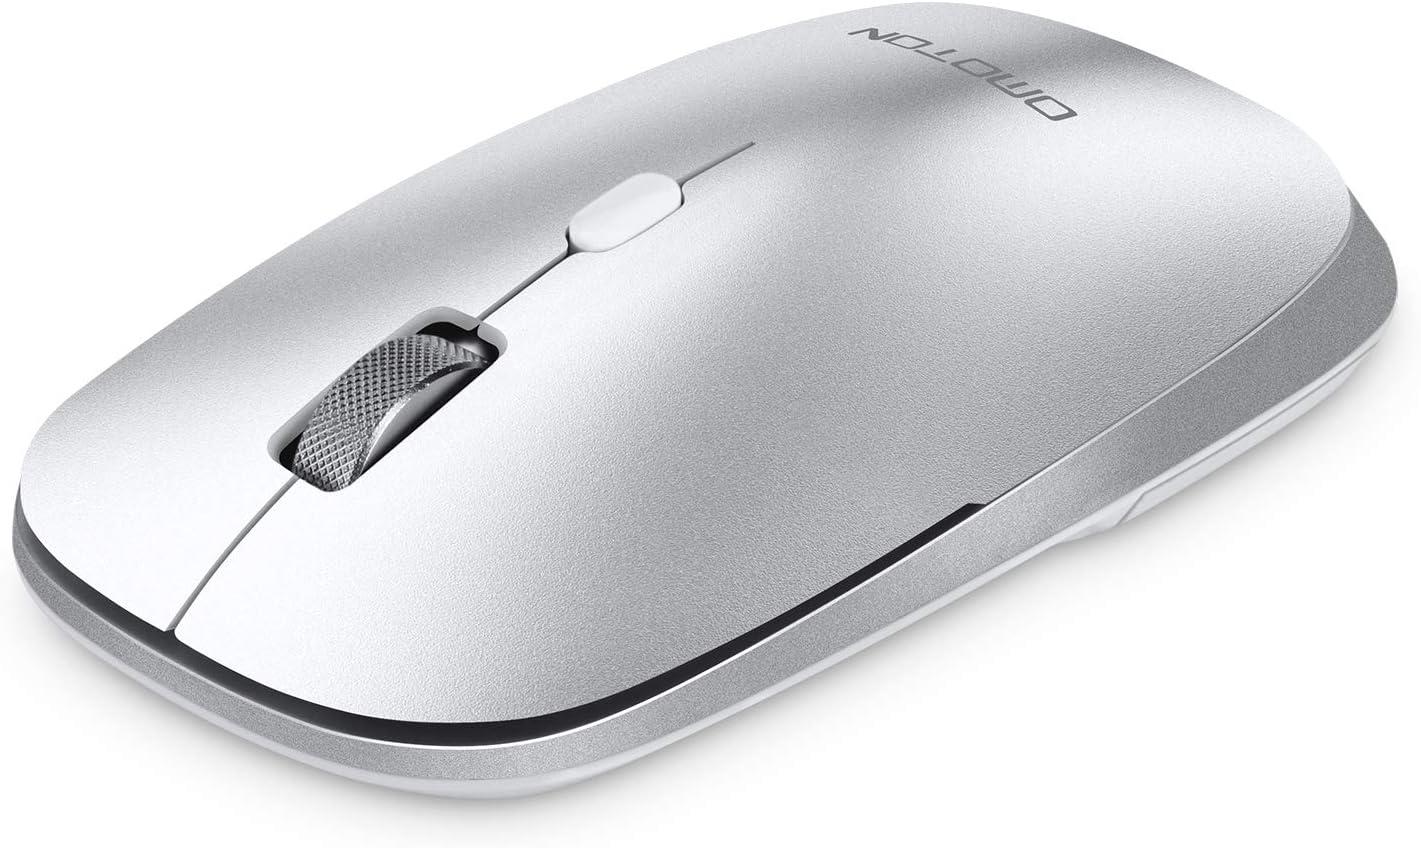 Omoton Dual-Mode Bluetooth Wireless Mouse $7.49 Coupon